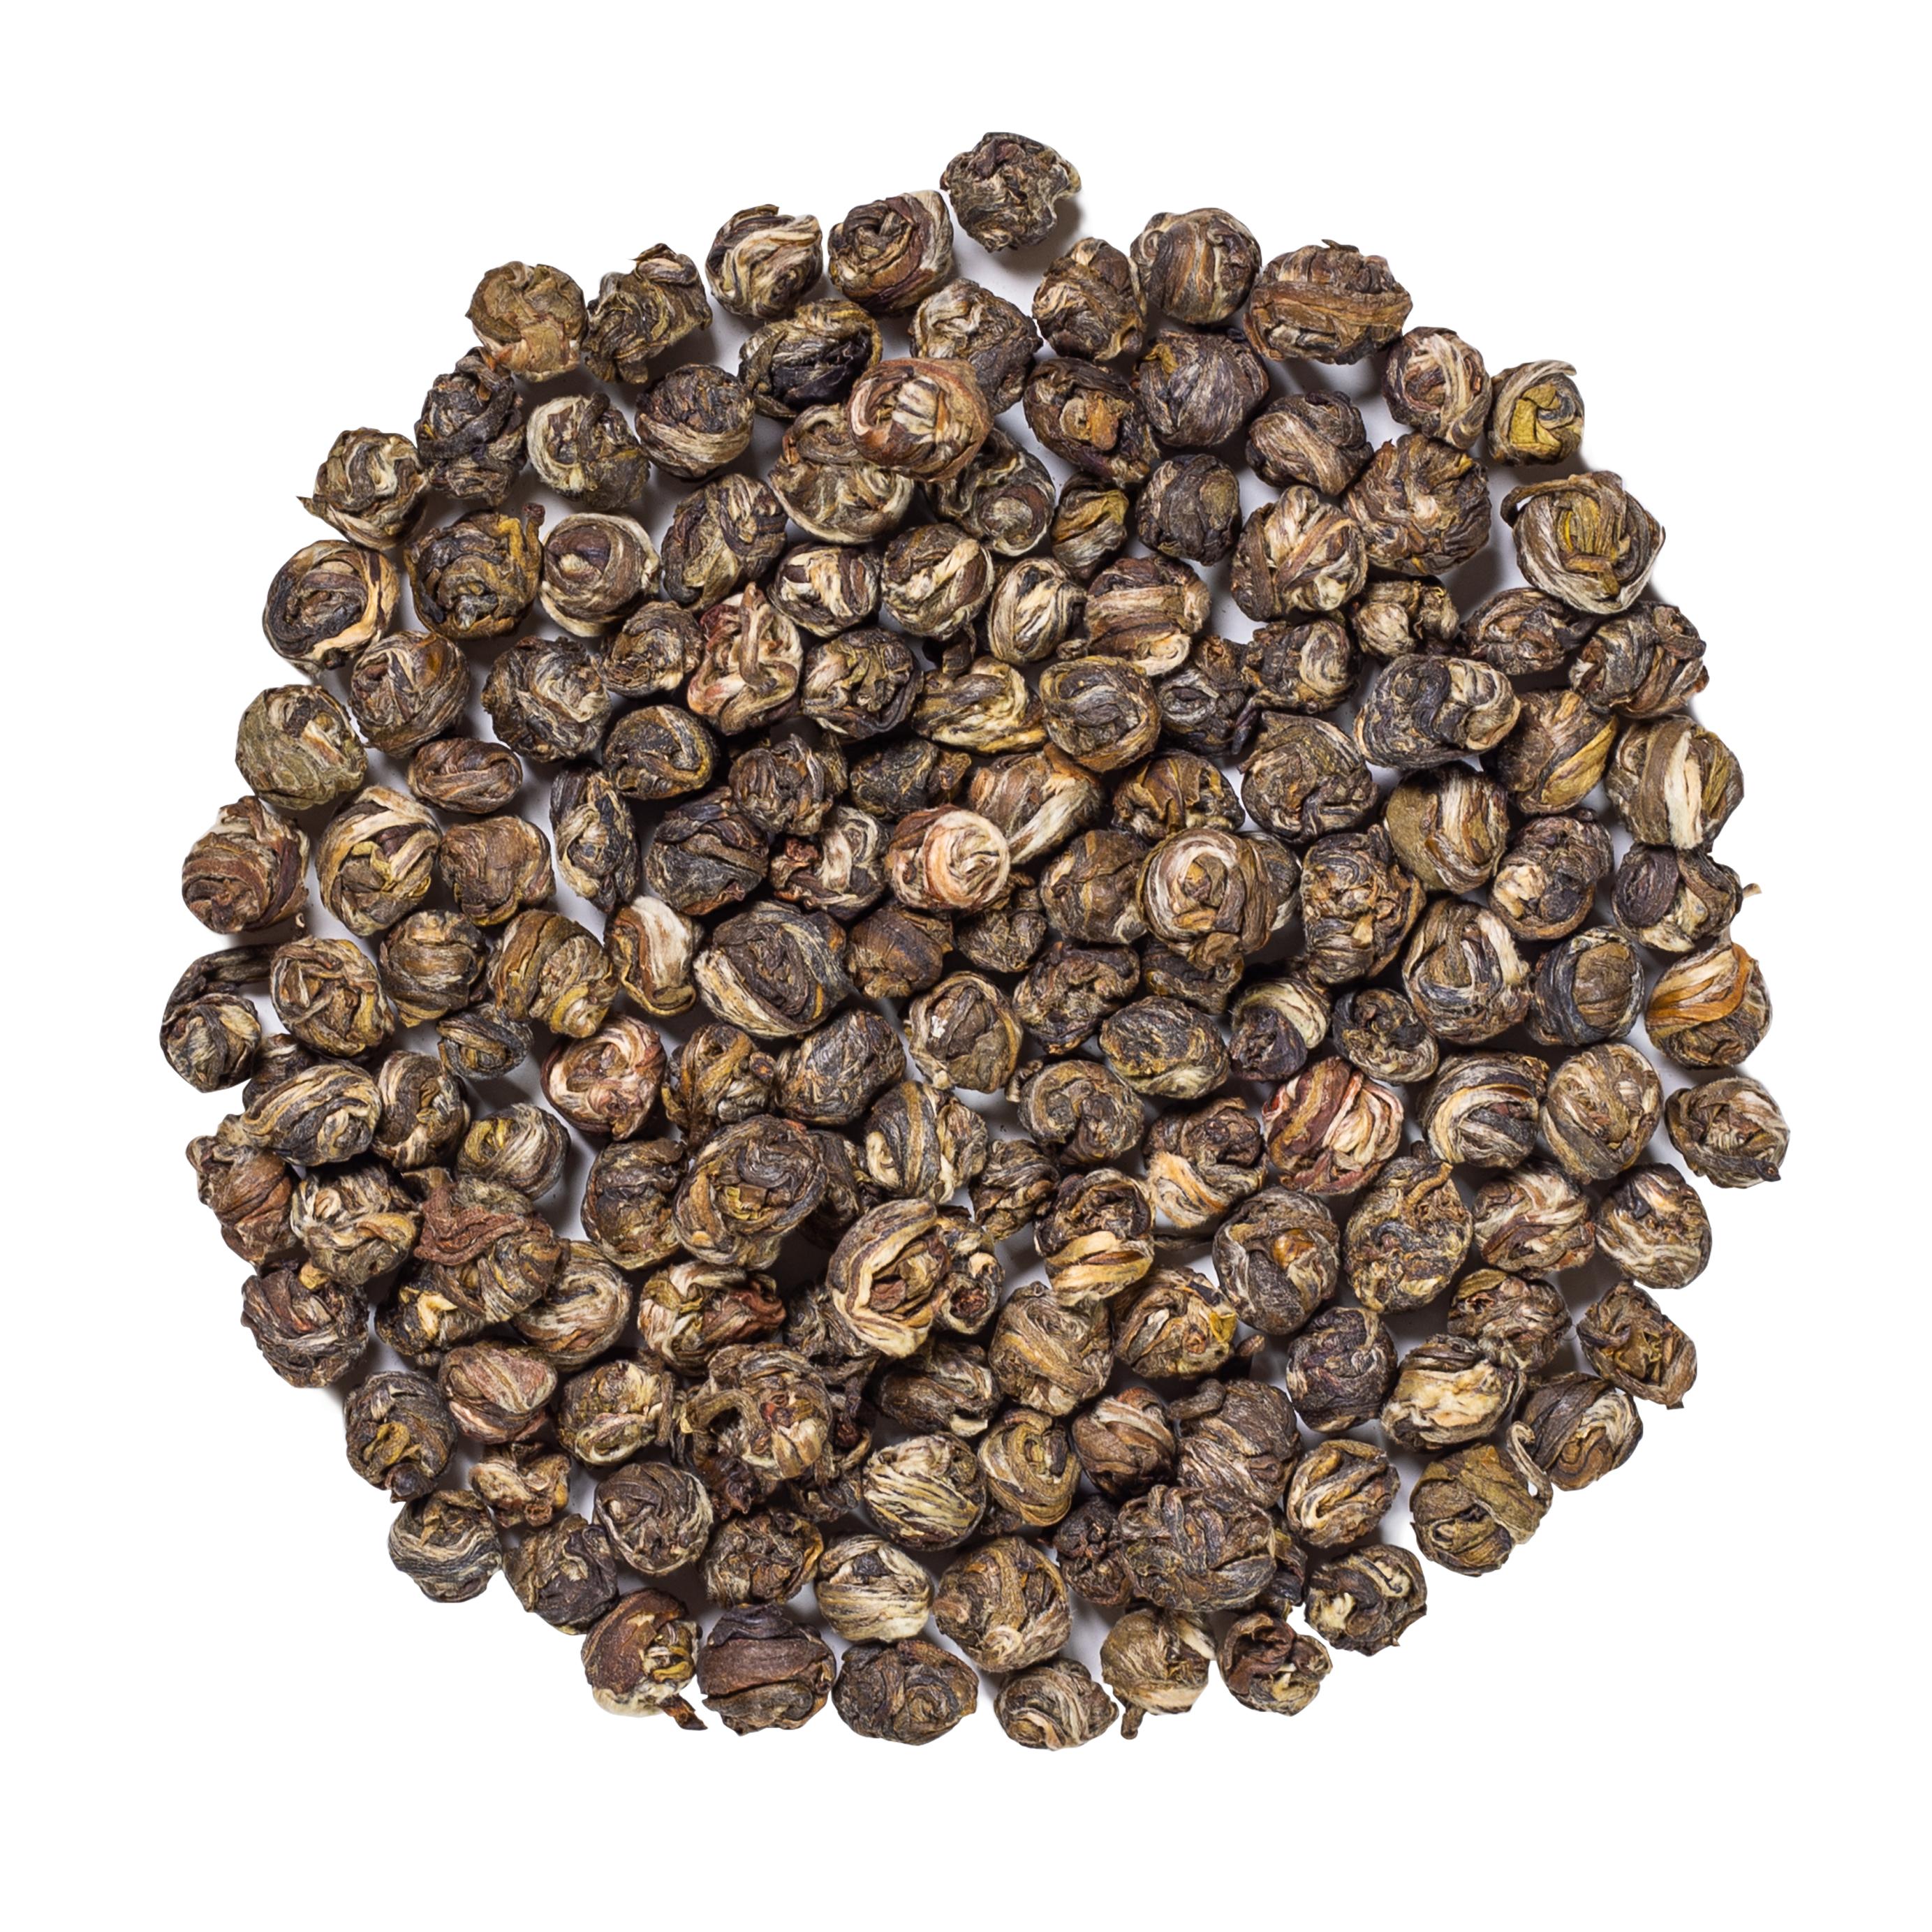 KUSMI TEA Perles de Jade au Jasmin bio - Thé vert de Chine, Jasmin - Kusmi Tea